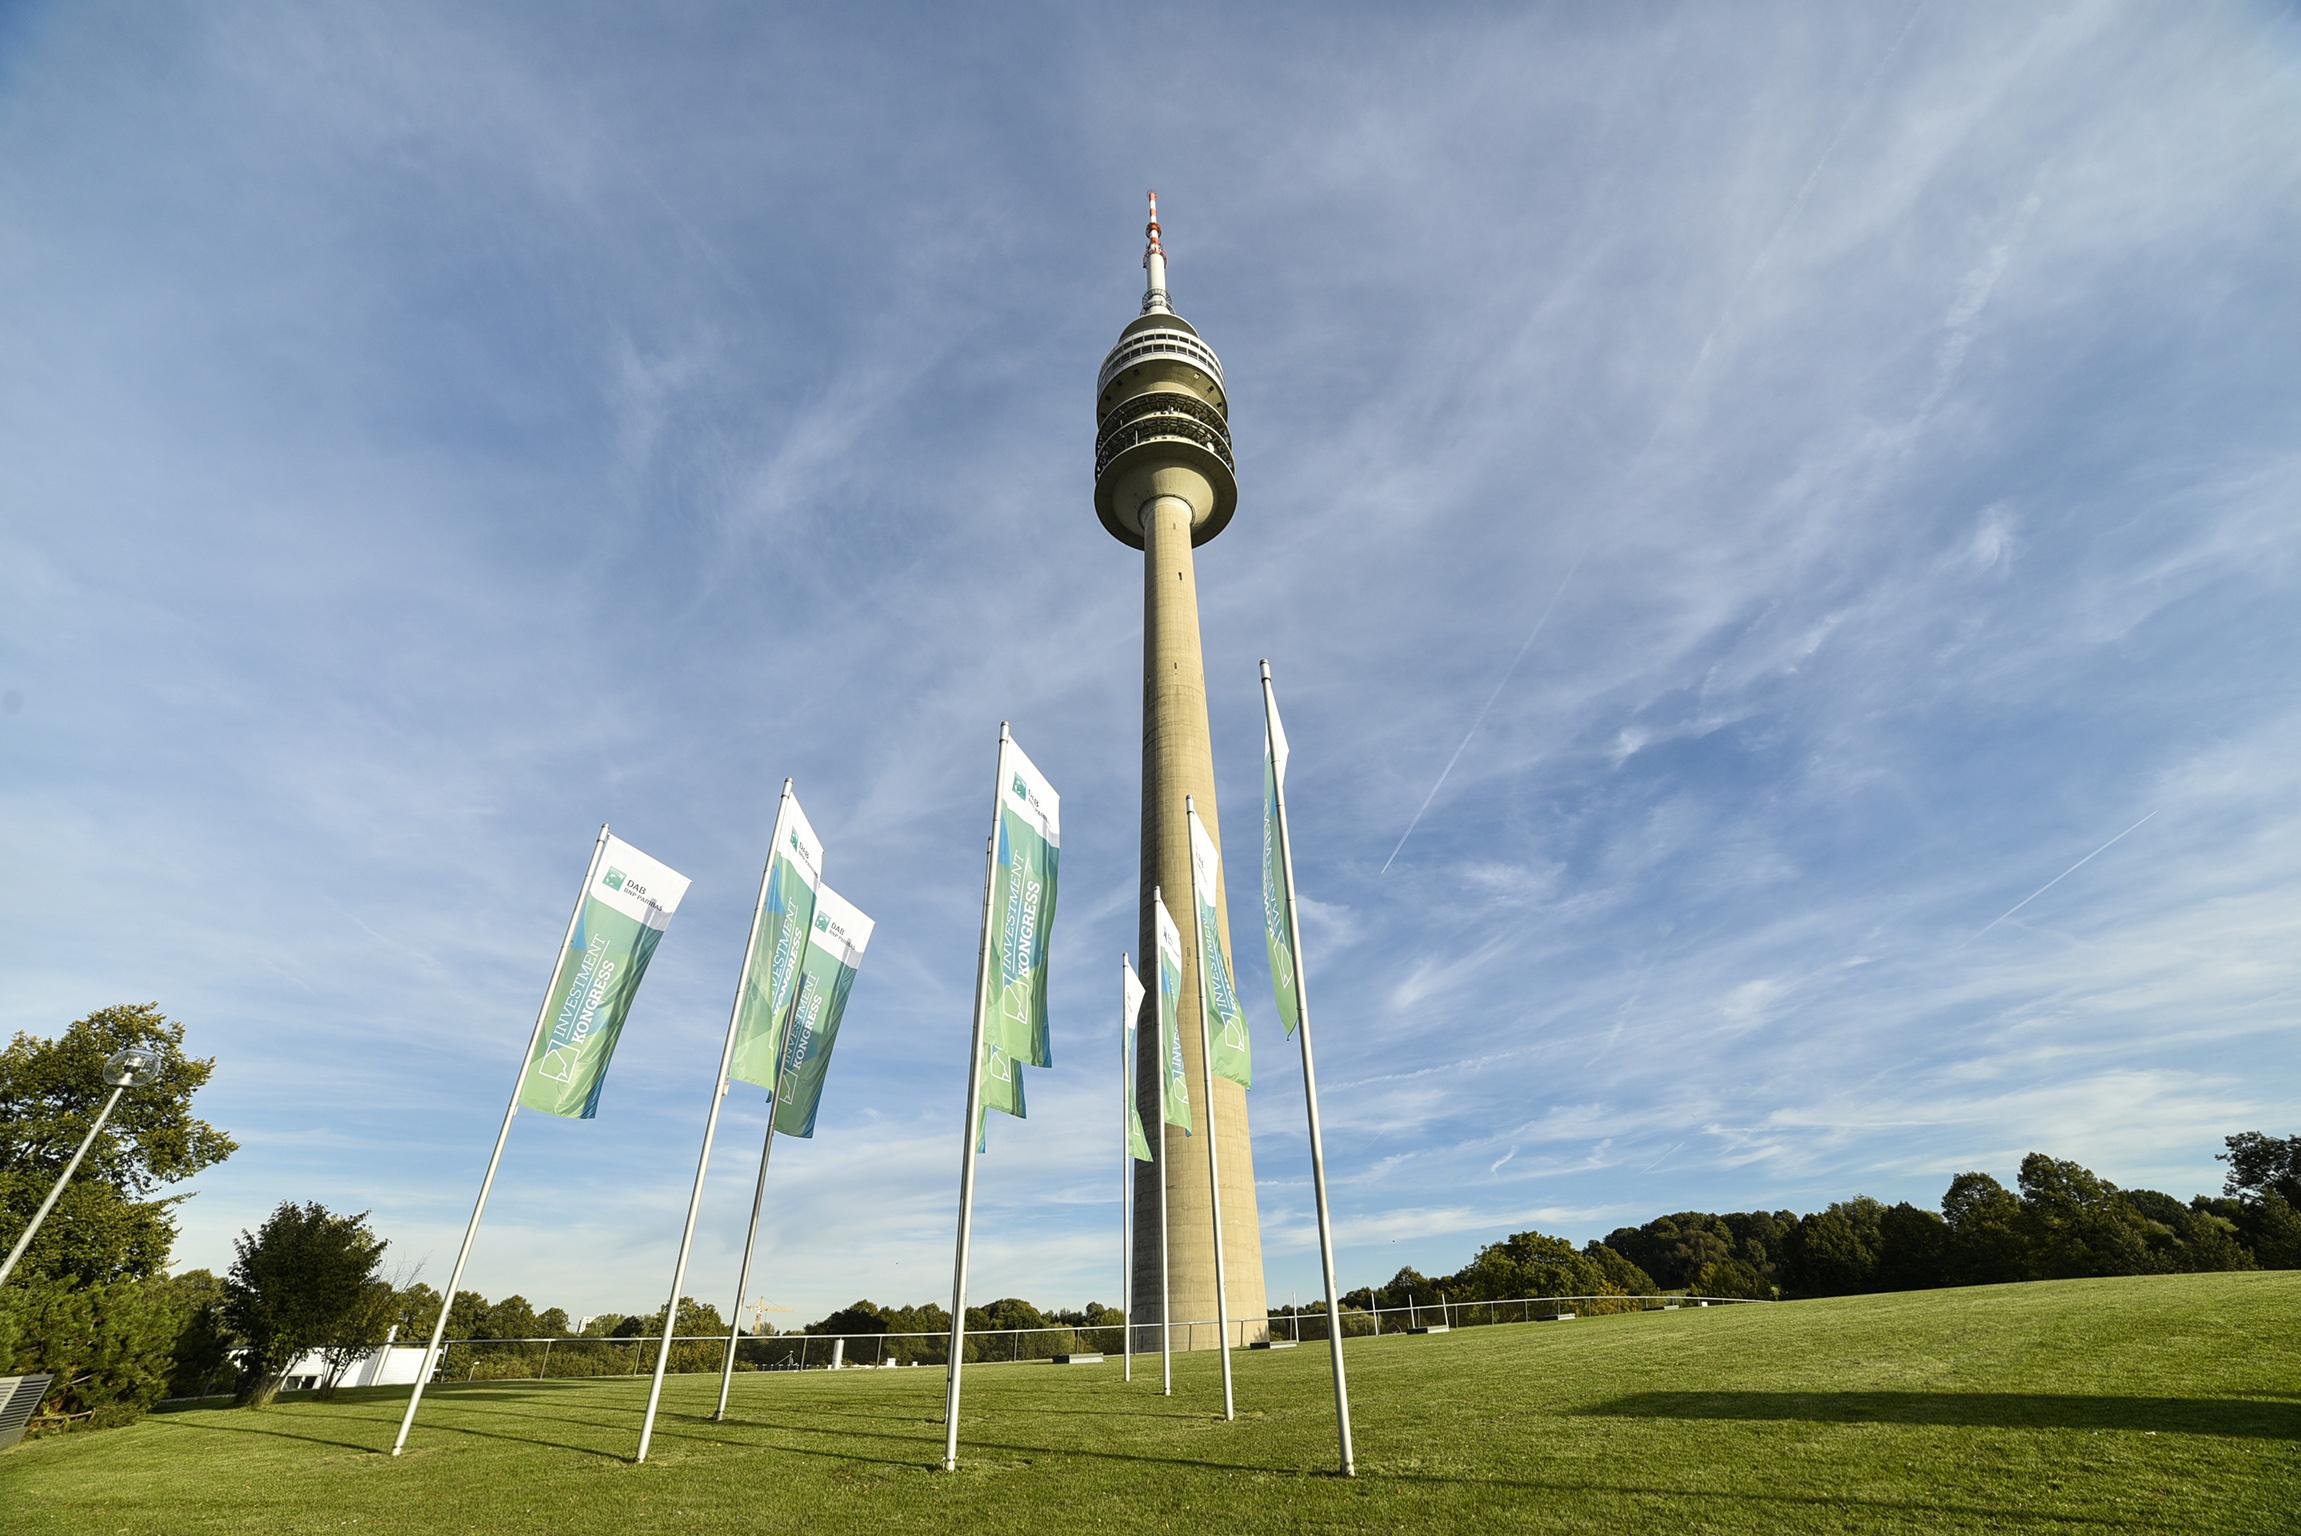 L'Olympiaturm presso l'Olympiapark - Monaco di Baviera